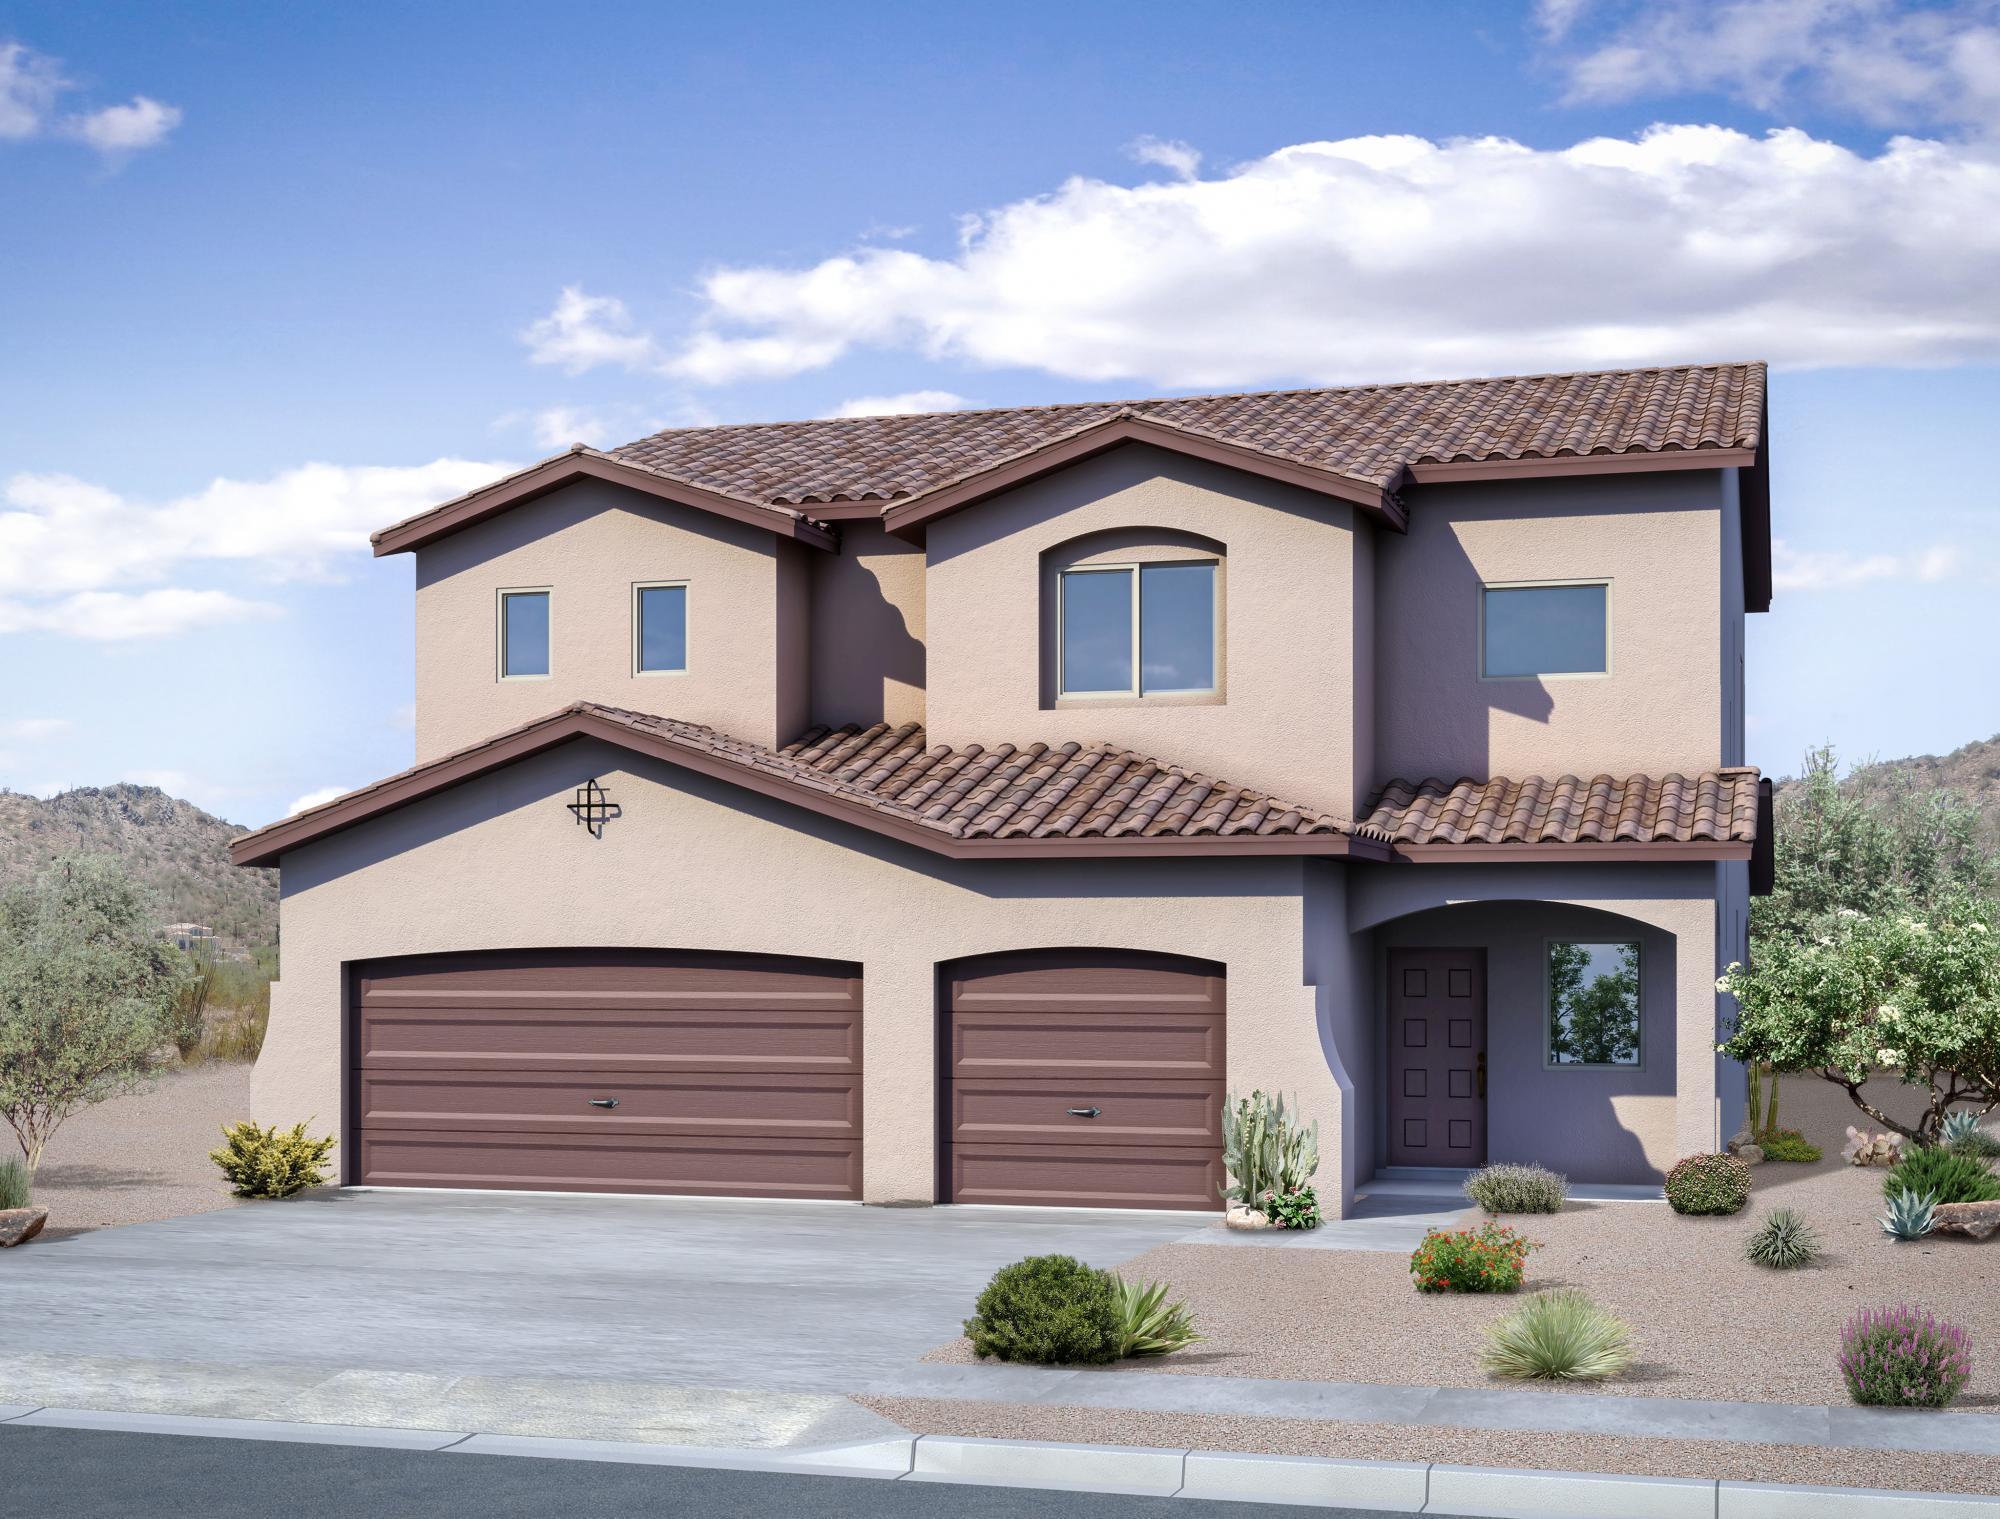 Single Family for Sale at Rancho Valencia - The Rosa Ii 1620 Camino Canyon Sw Los Lunas, New Mexico 87031 United States